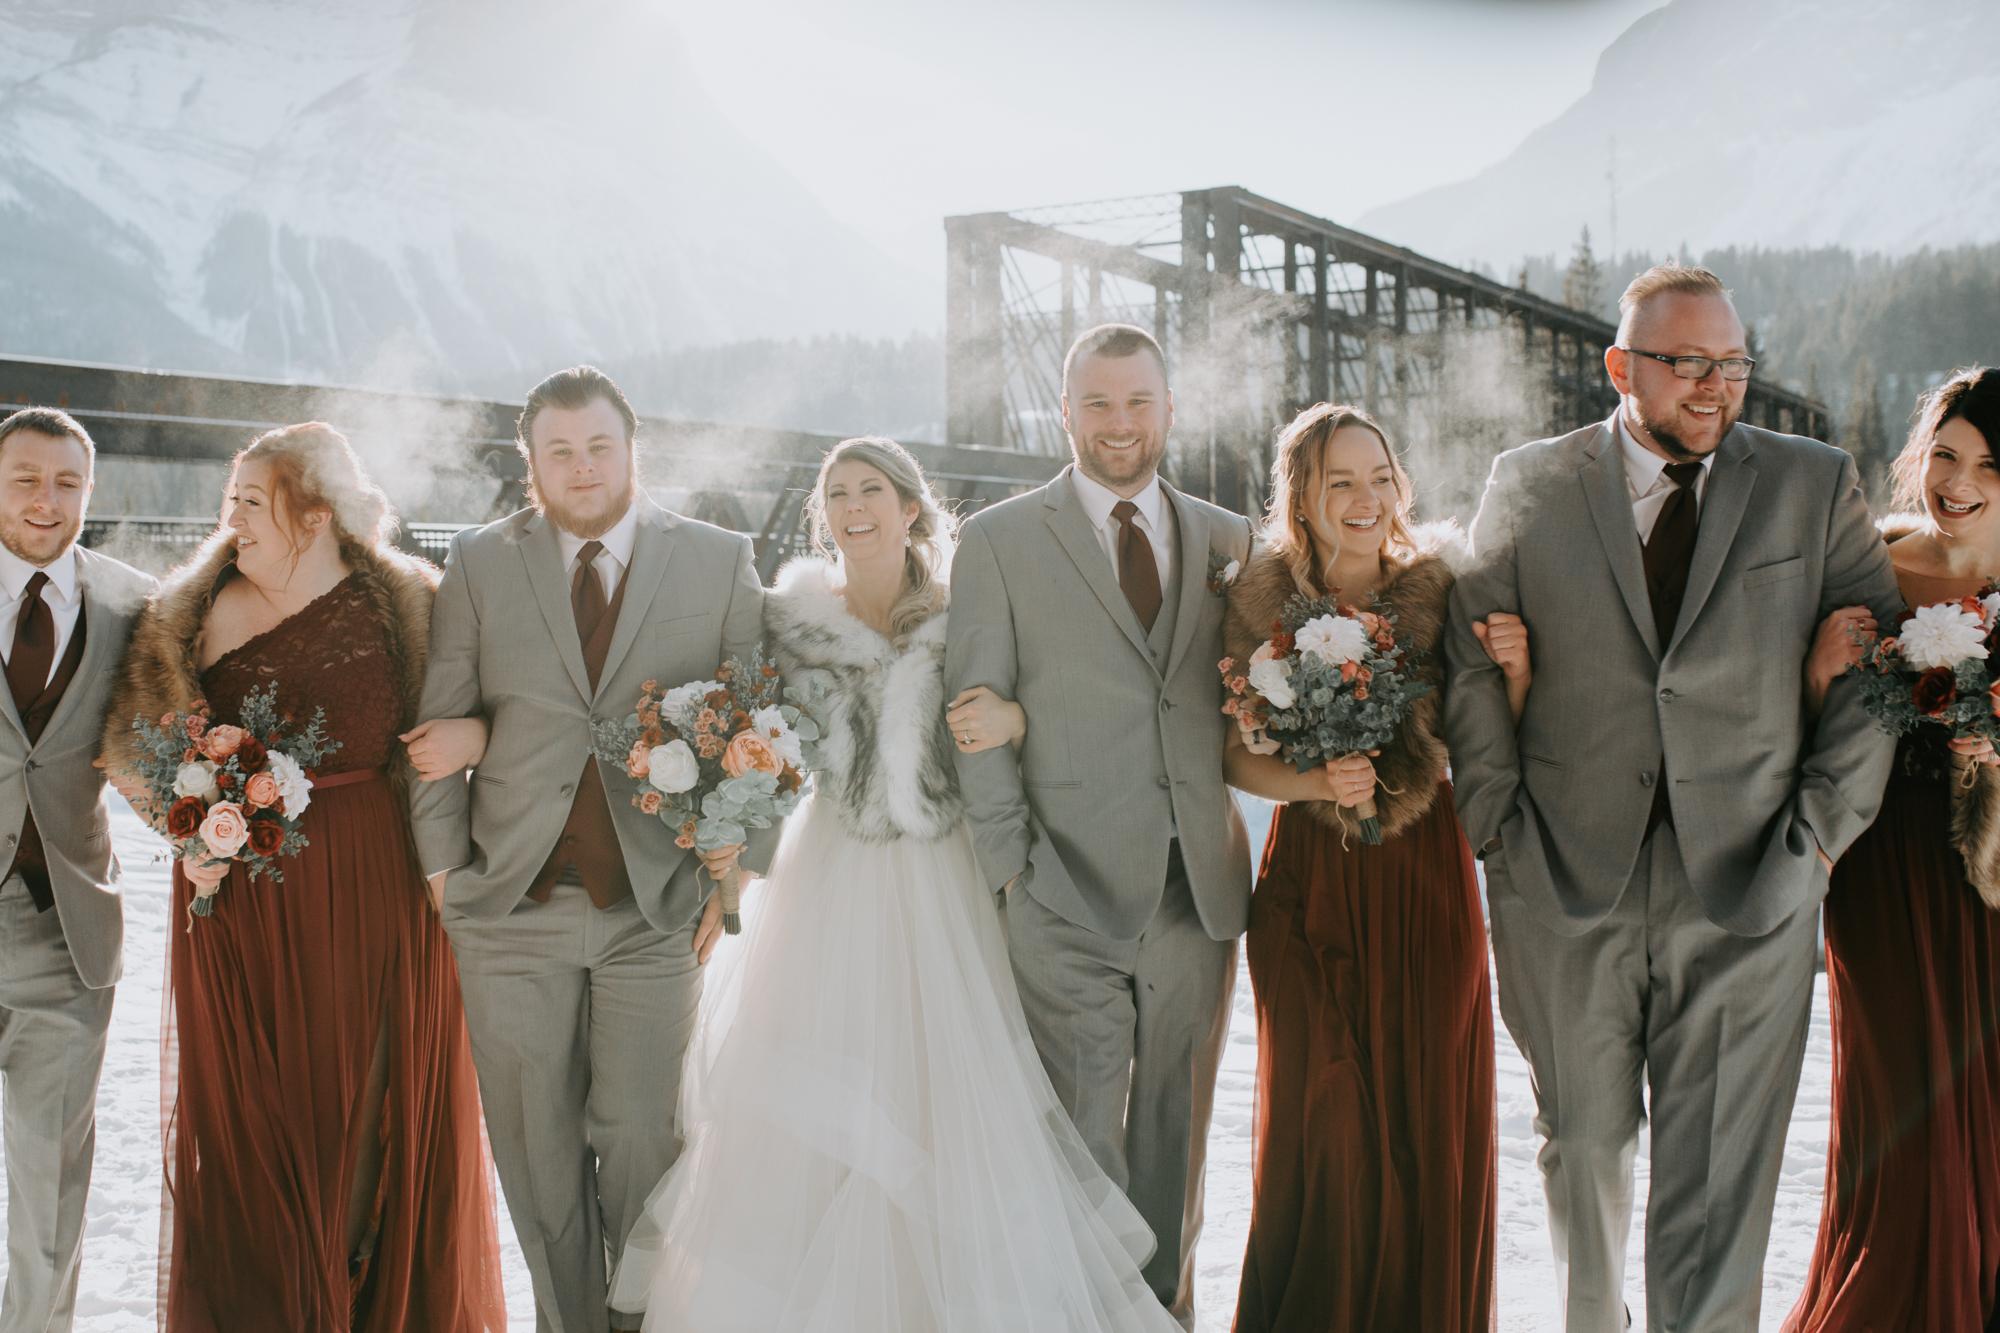 Stewart-Creek-Wedding-AJ-58.jpg